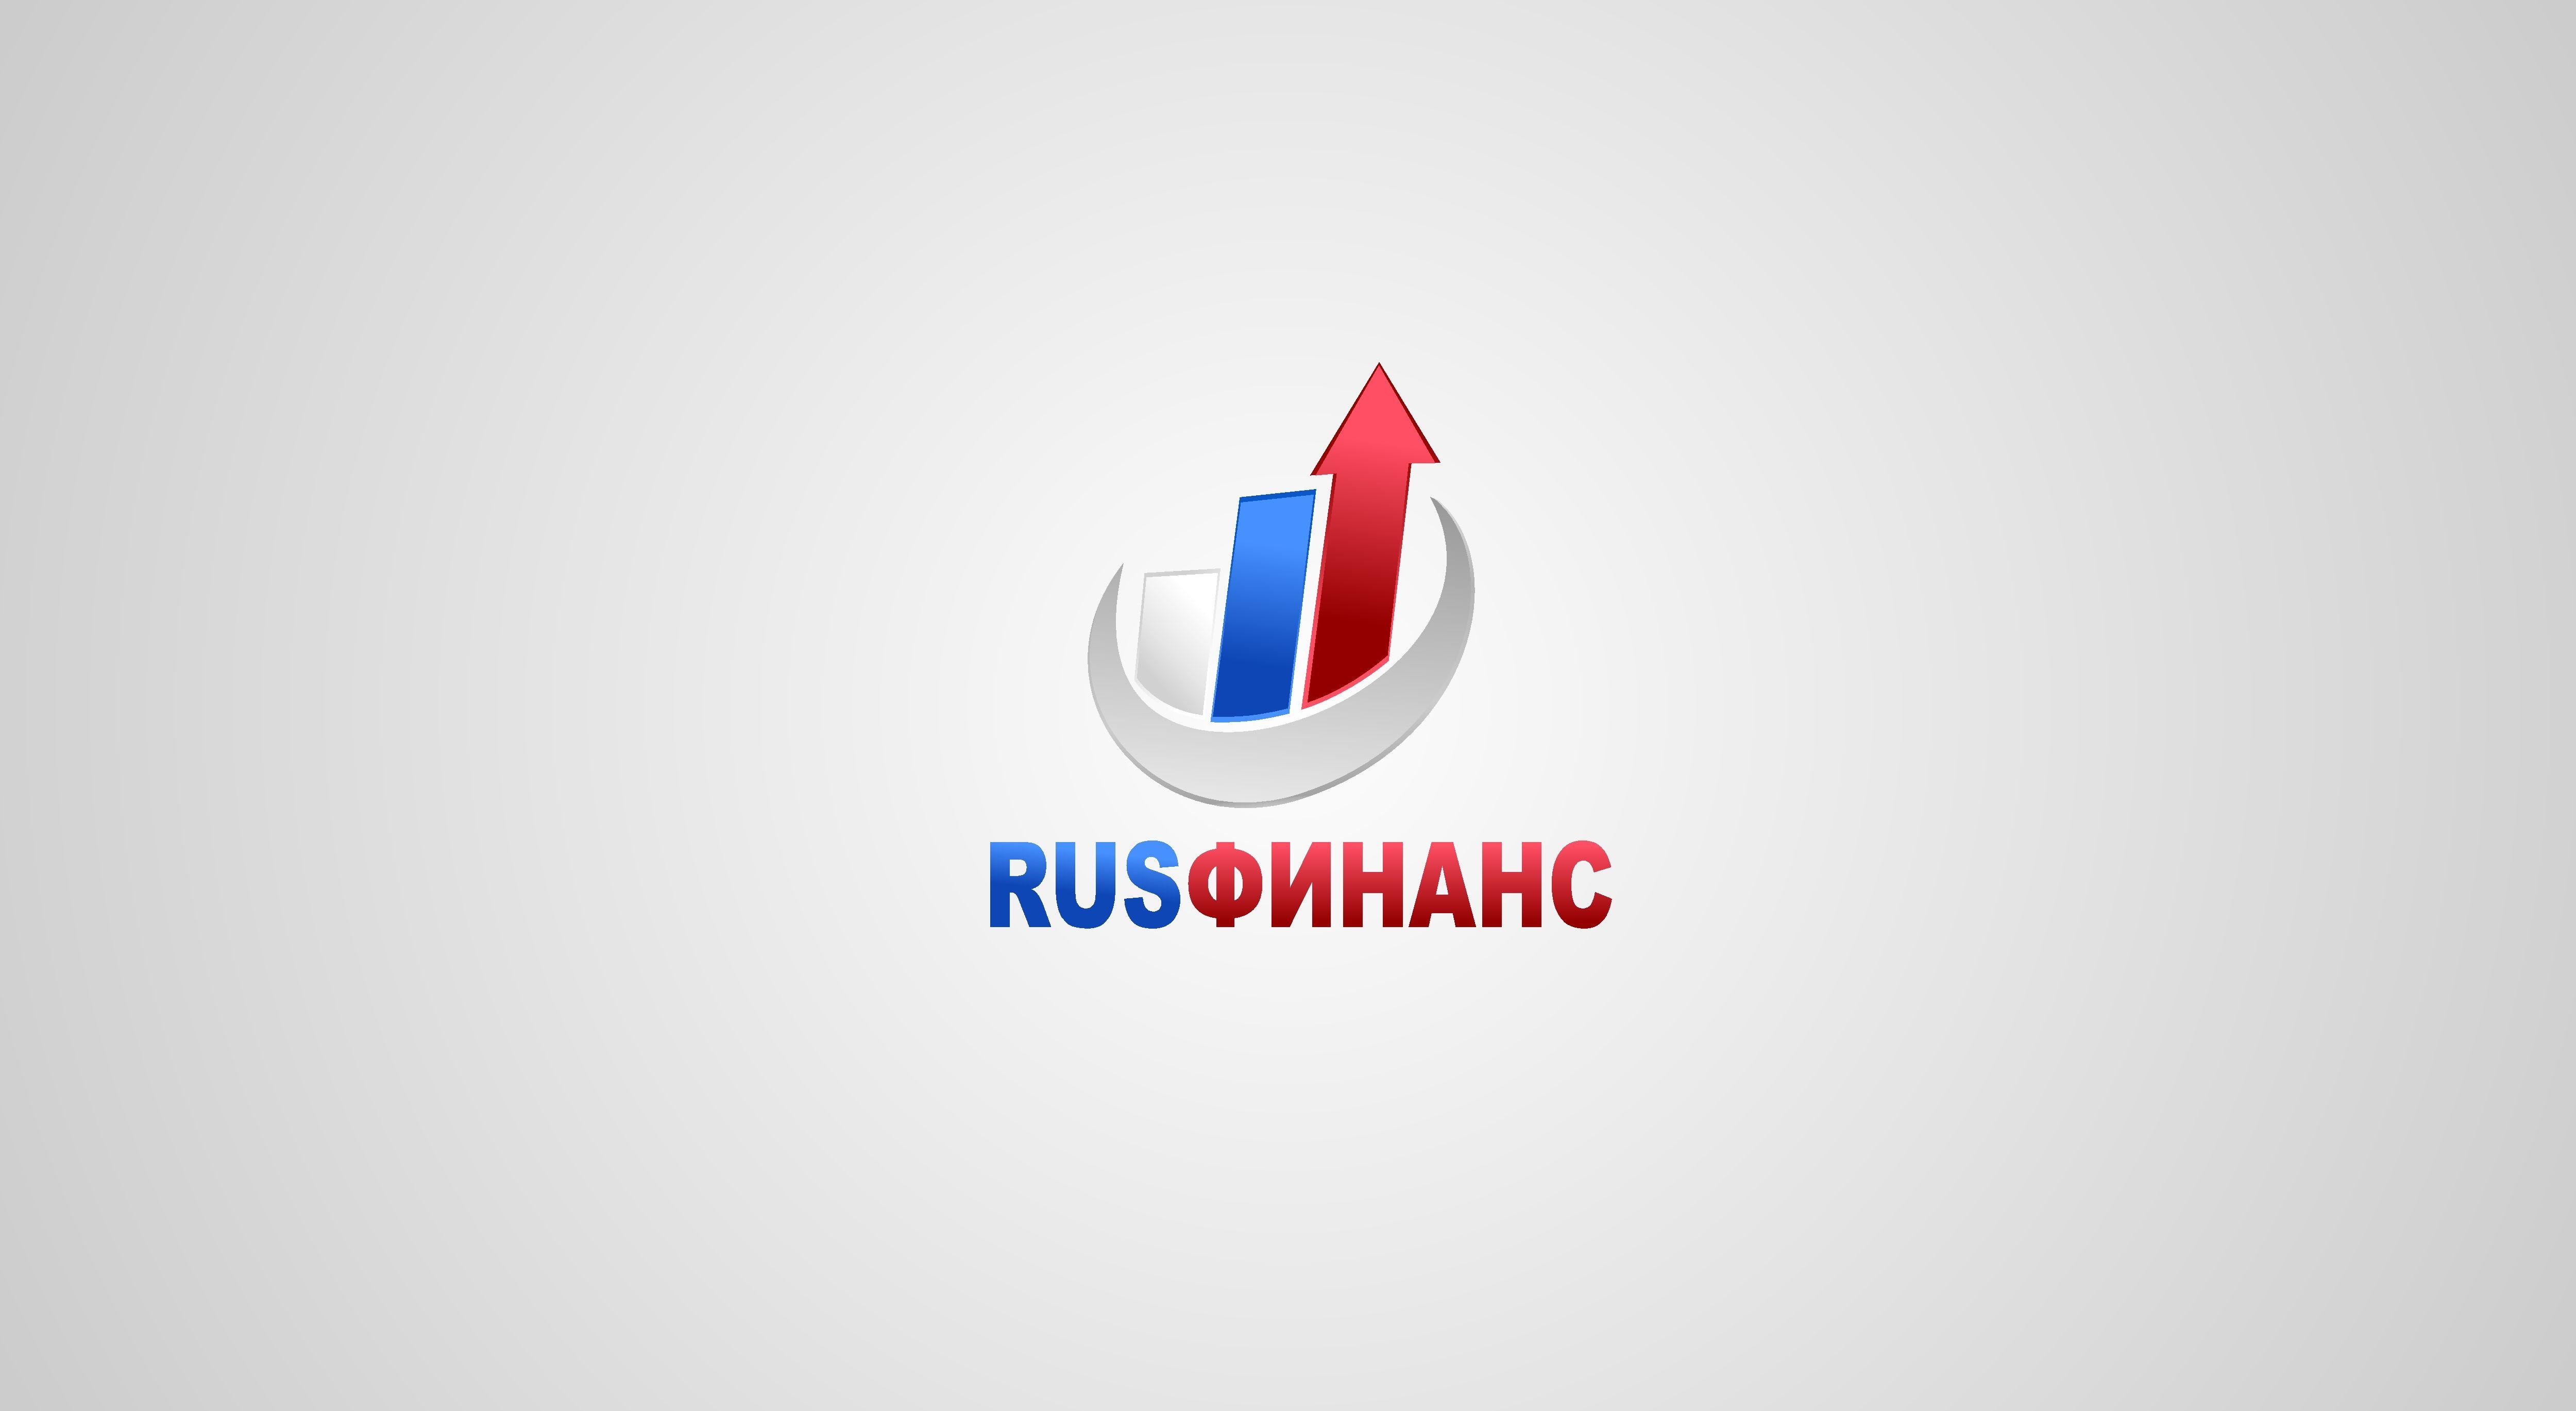 Логотип для Русфинанс - дизайнер Zarapin17